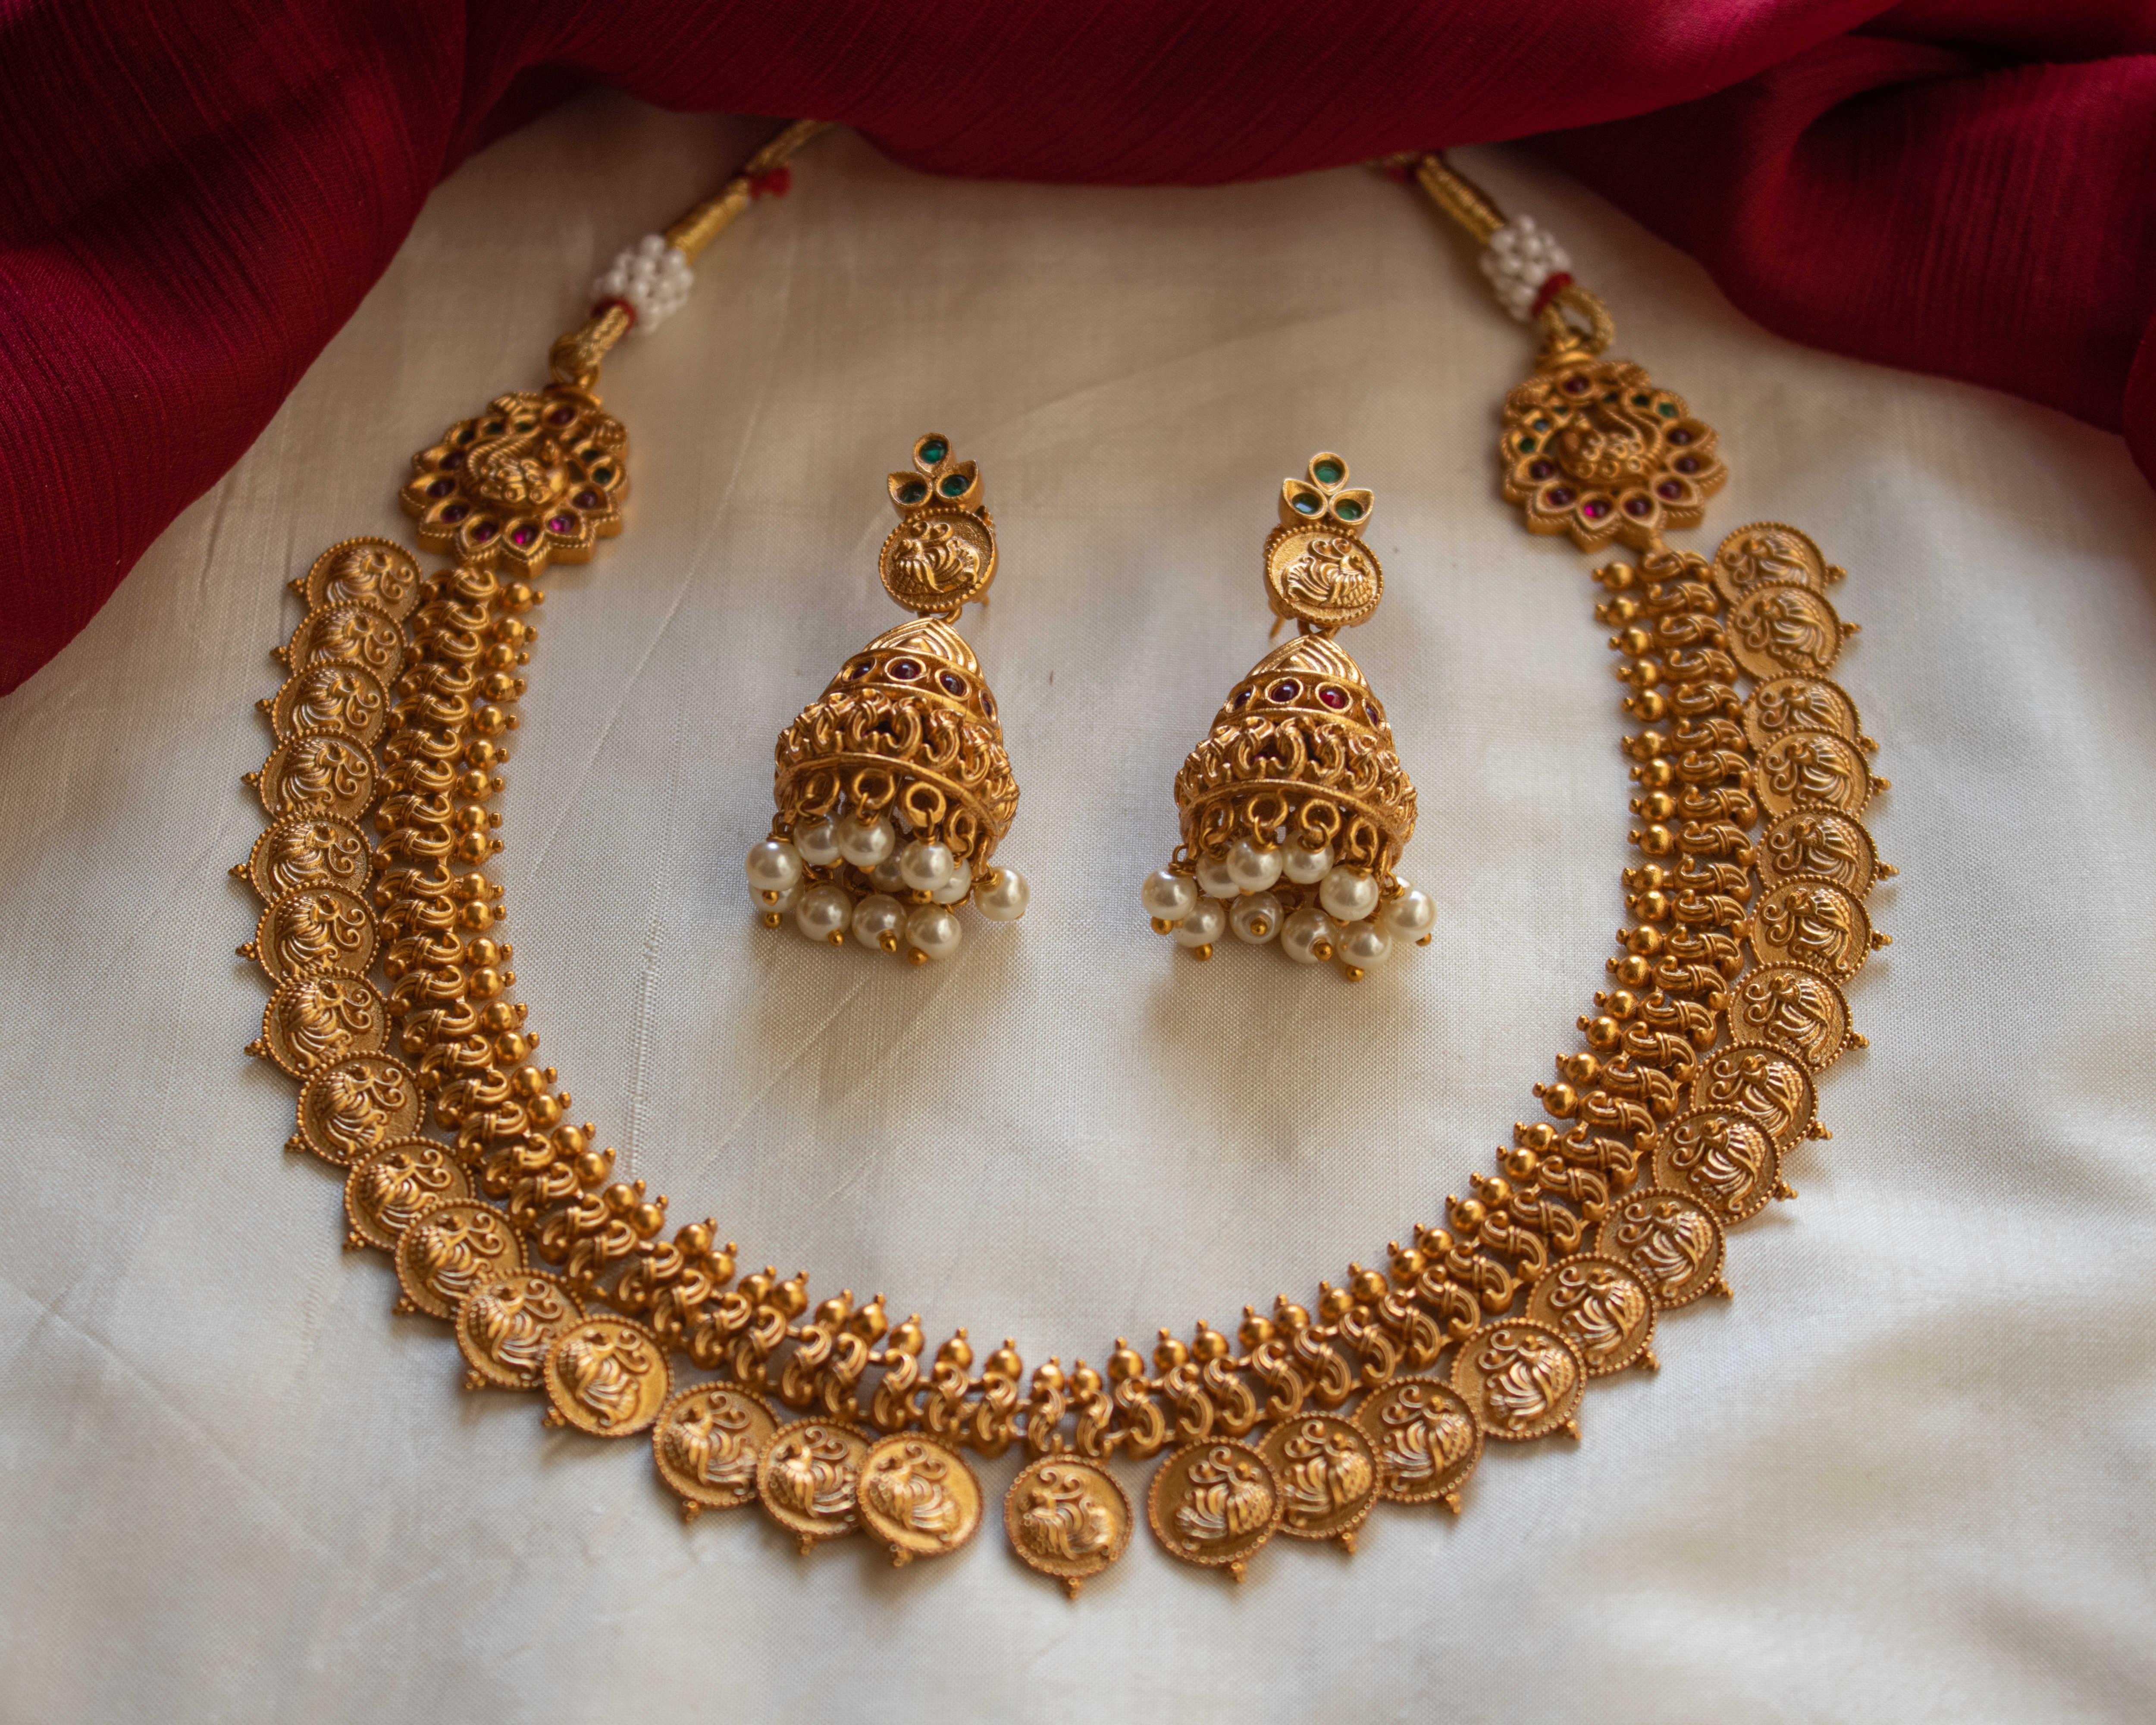 imitation-antique-jewellery-designs-1